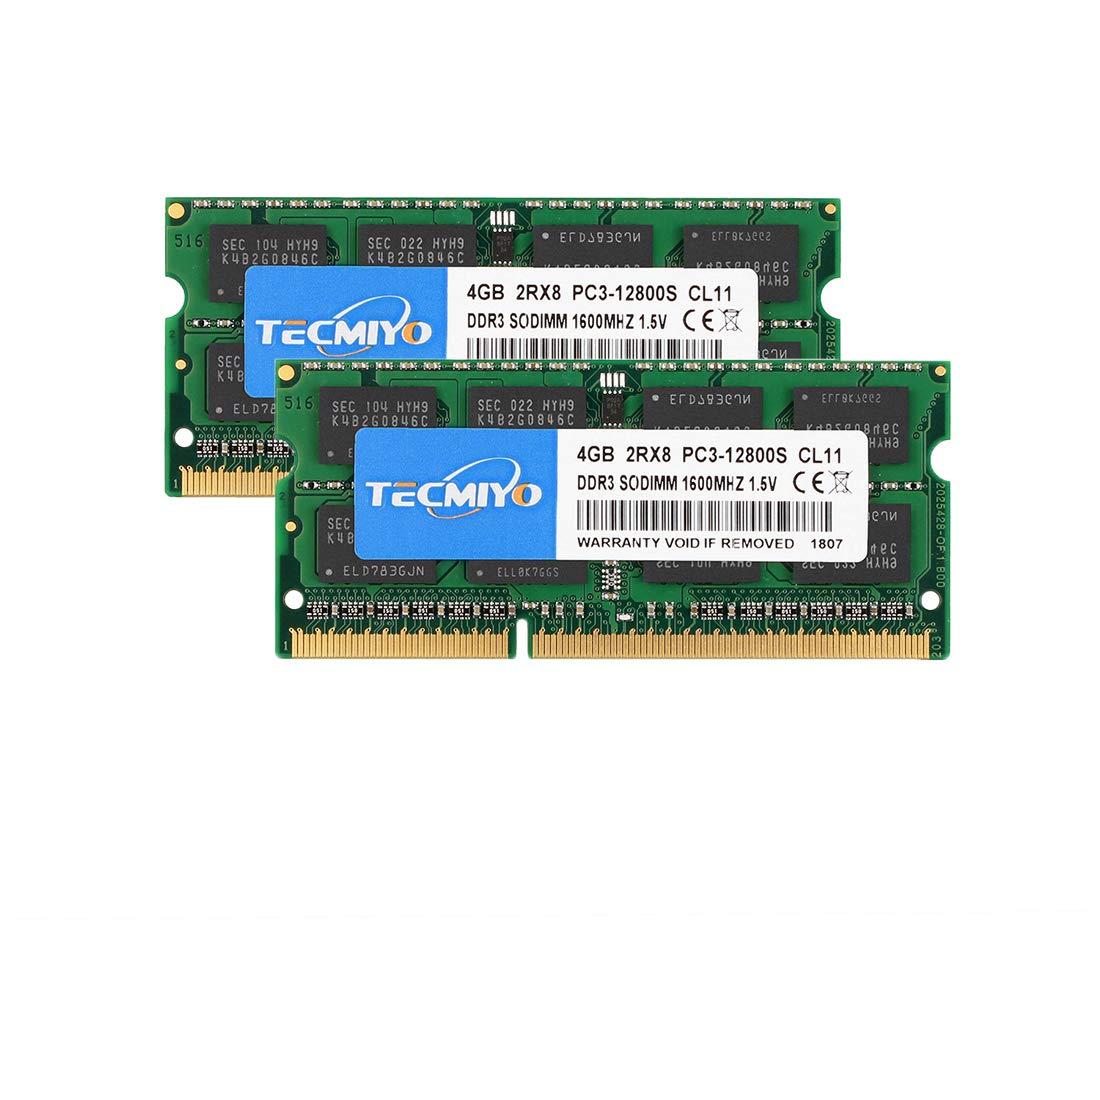 Hynix 4GB 8GB DDR3 RAM PC3-10600 DDR3-1333MHz 204Pin SODIMM 1.5v Laptop Memory